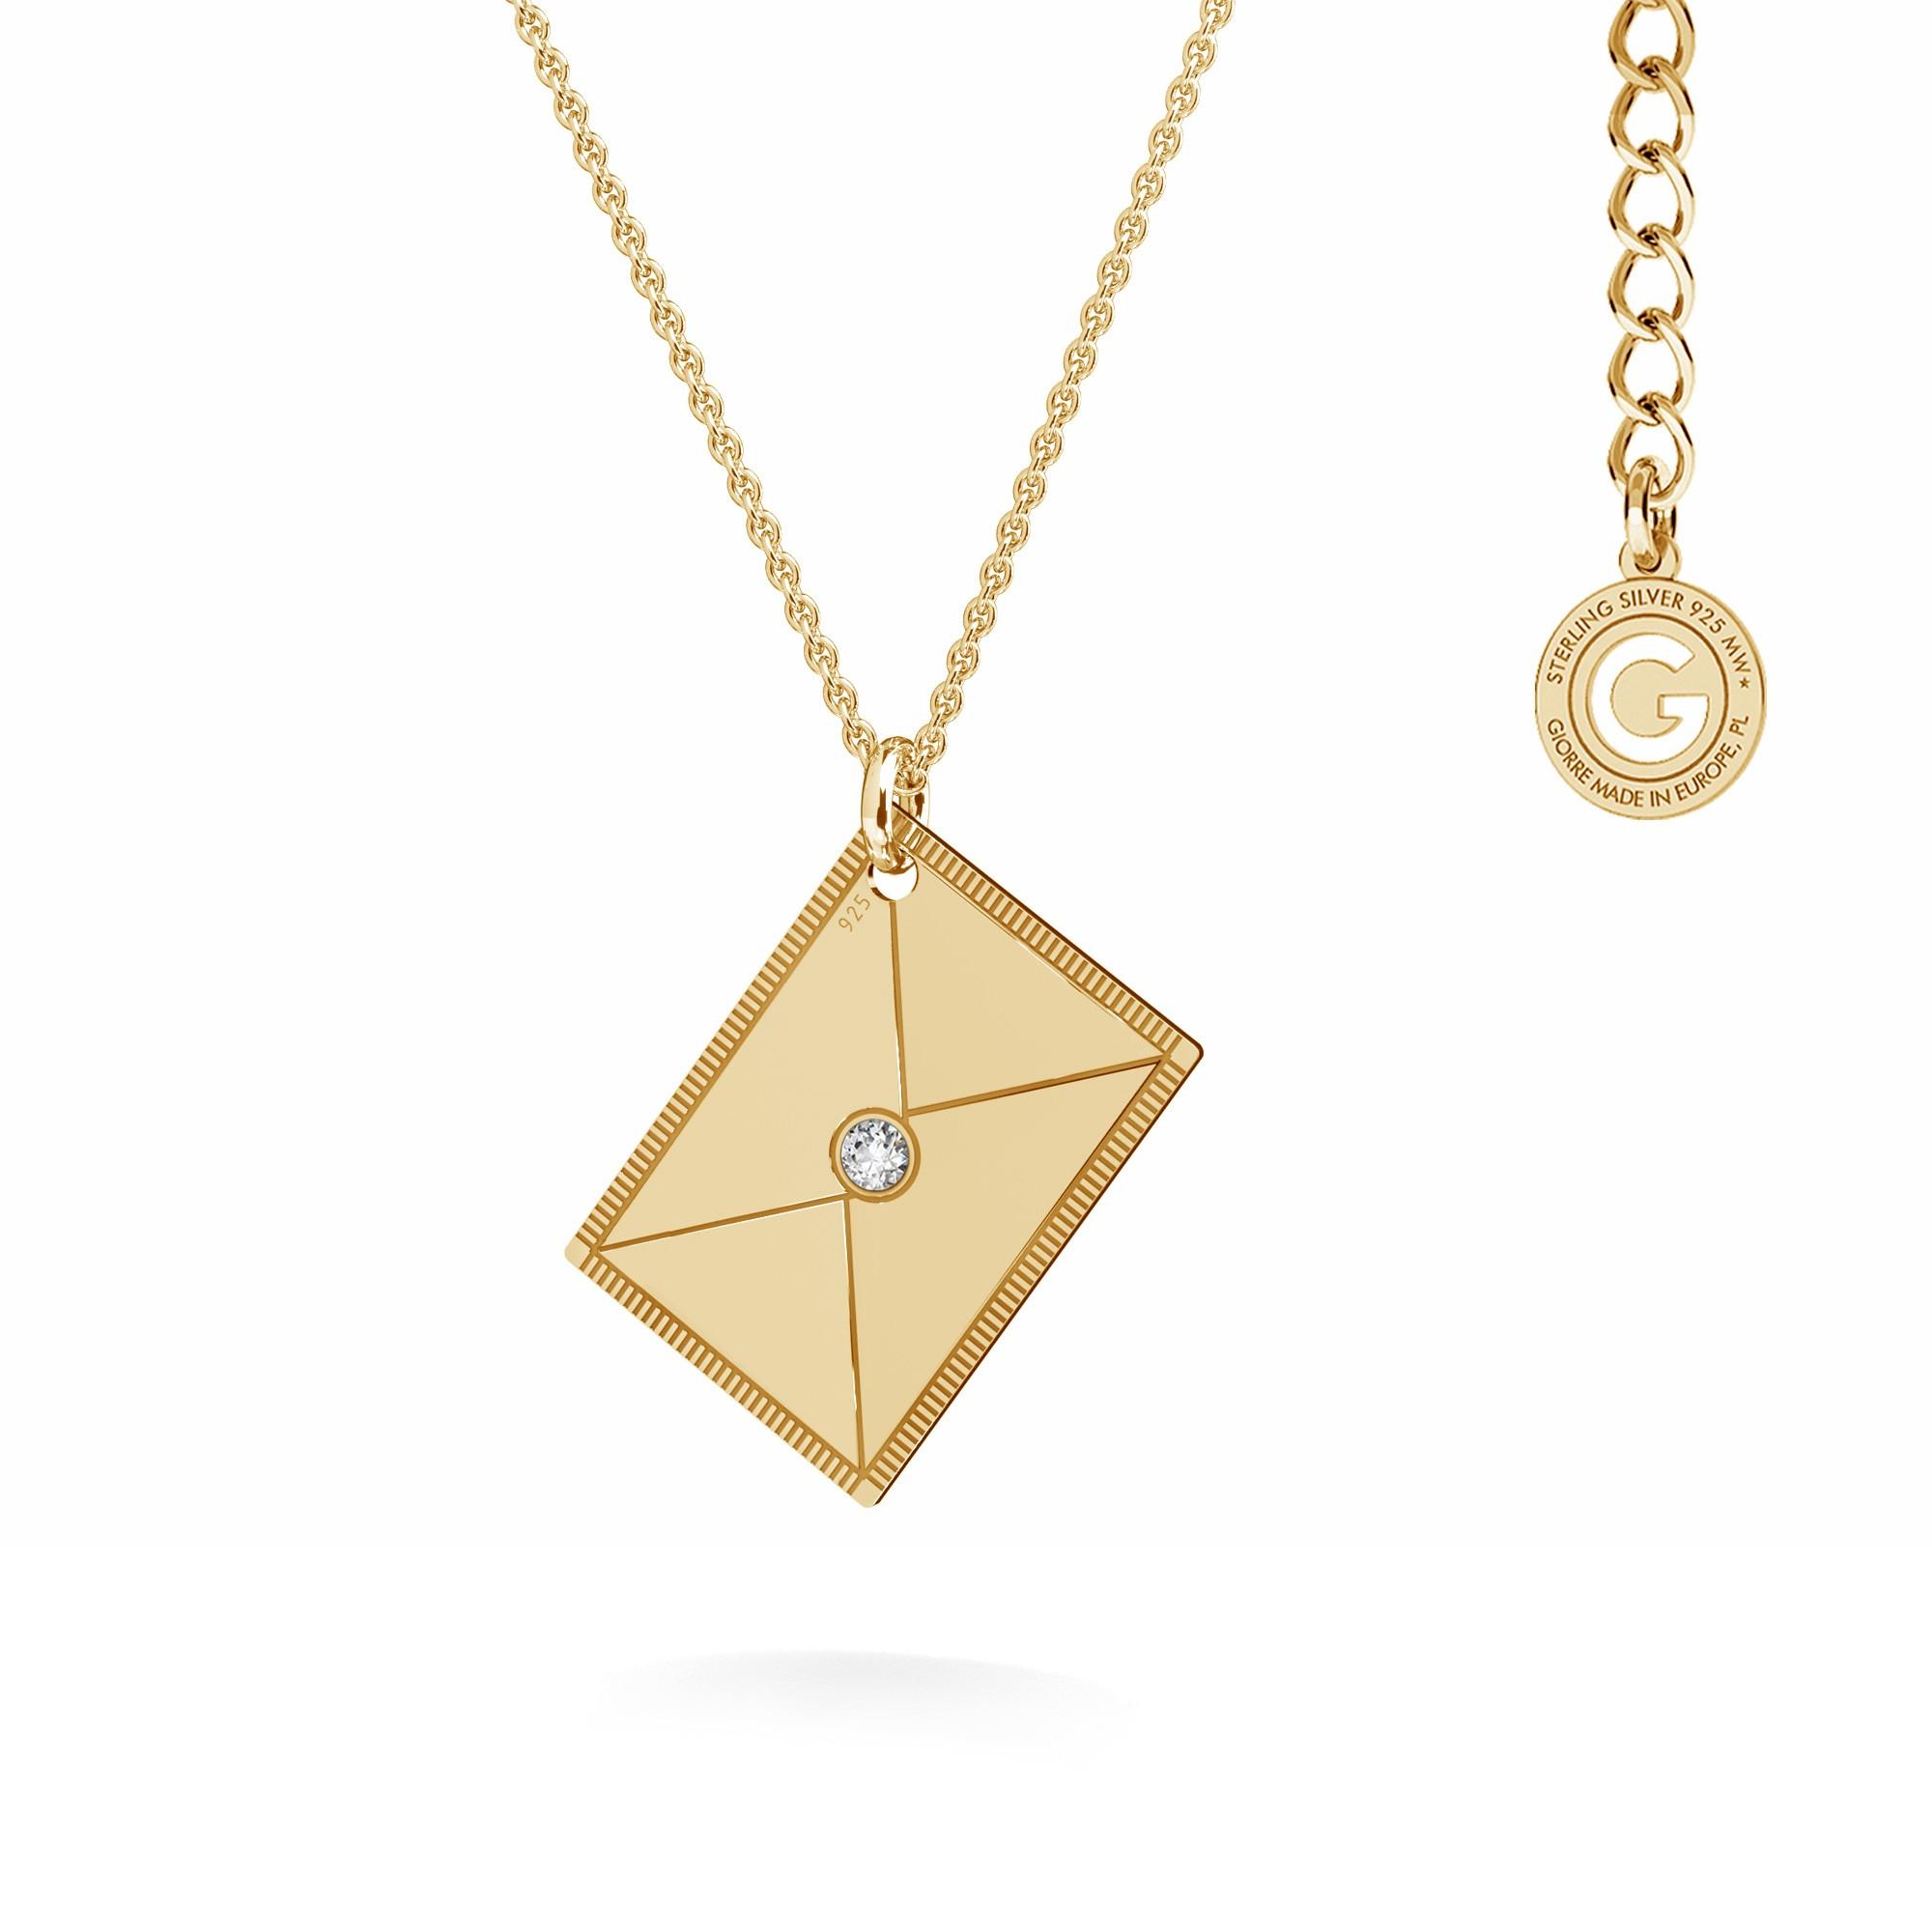 Srebrny naszyjnik list z kryształem, srebro 925